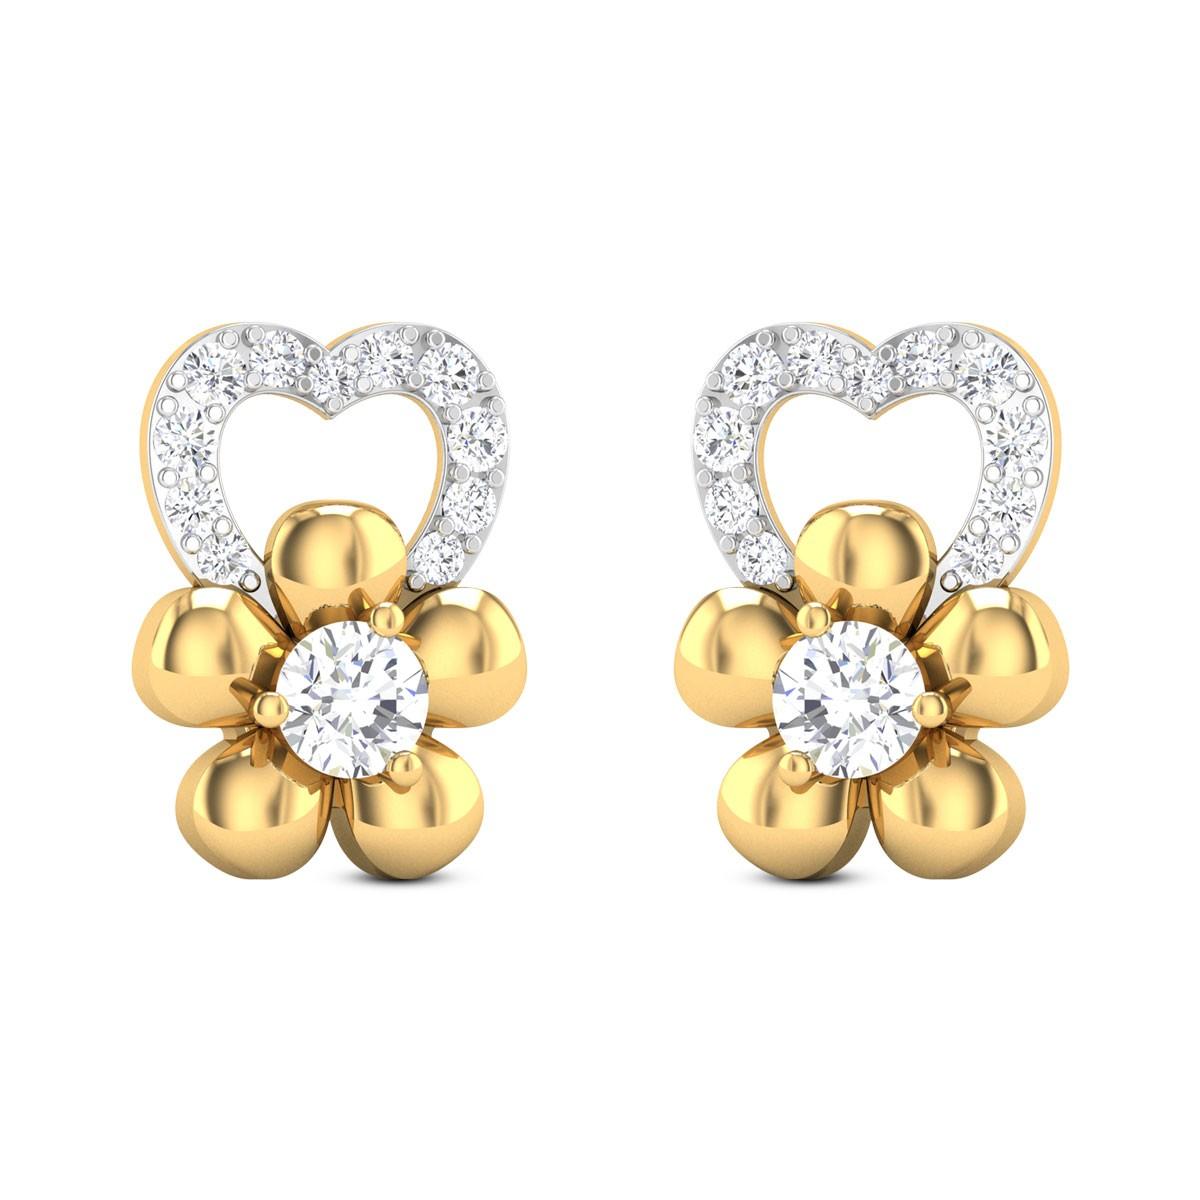 Gul Floral Diamond Stud Earrings